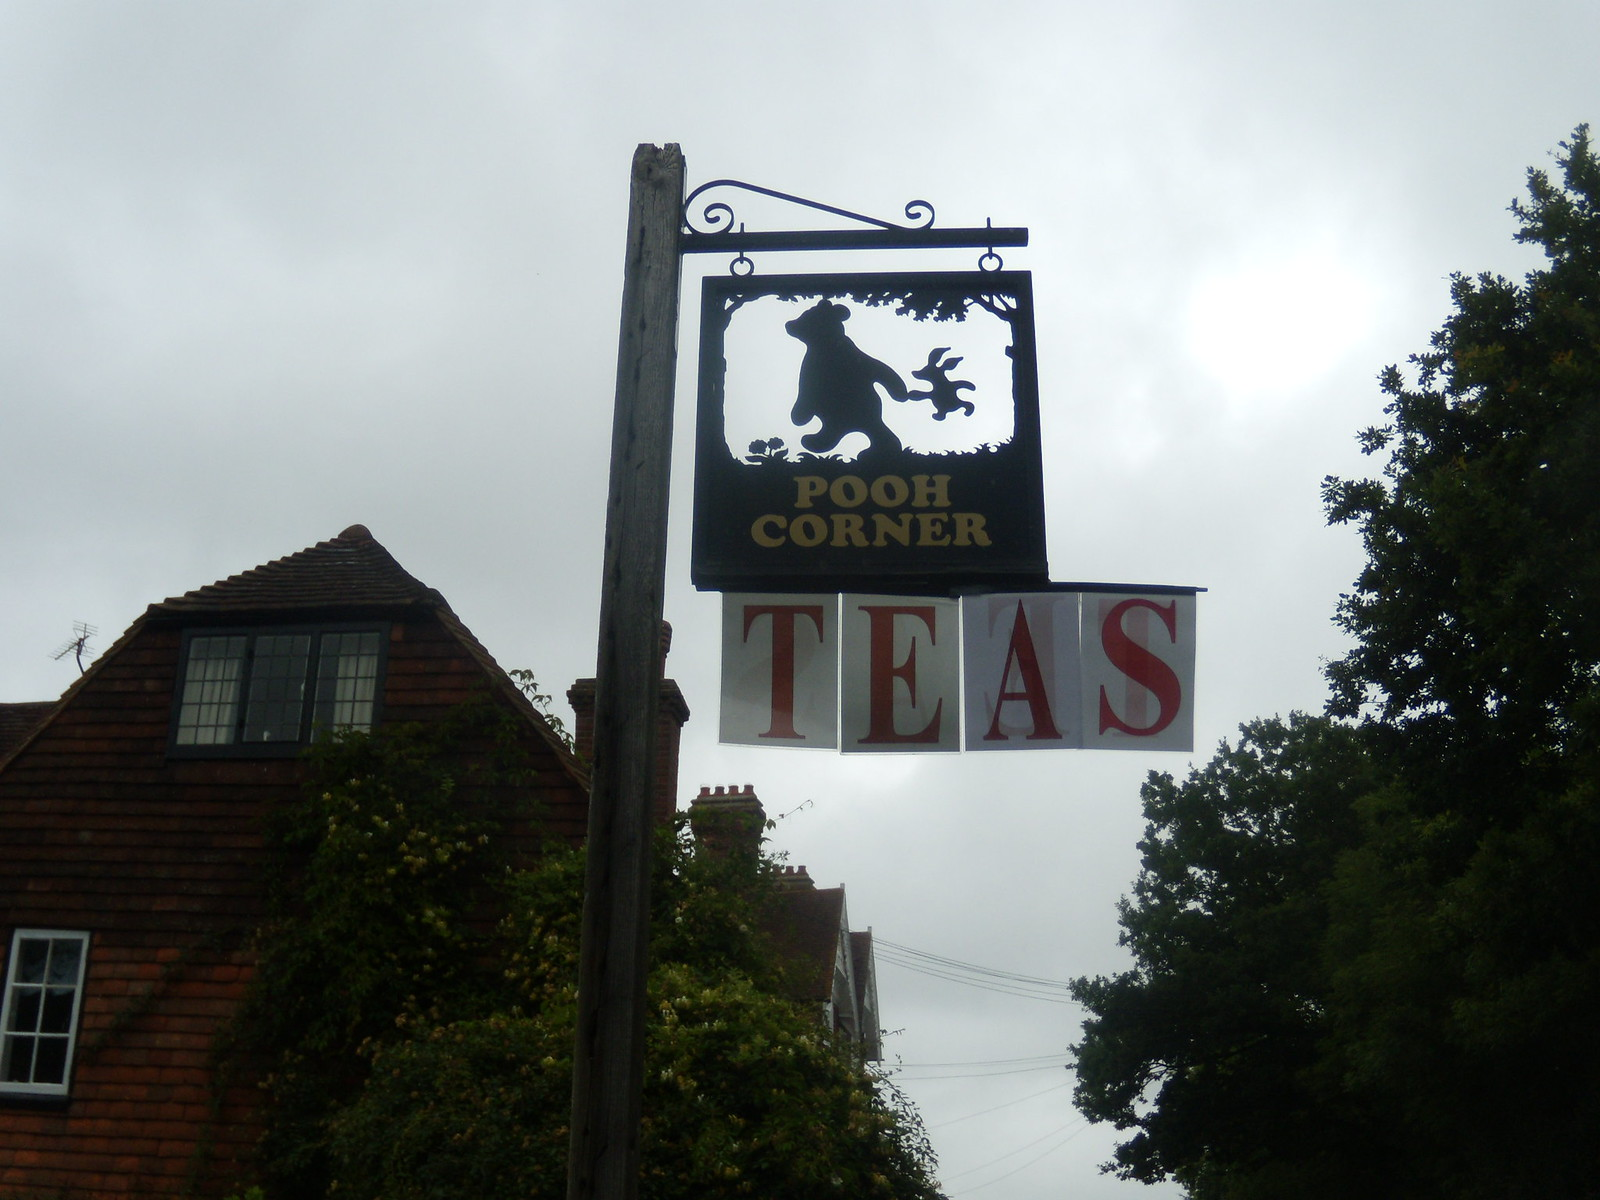 Tea at Pooh Corner Ashurst to Hartfield